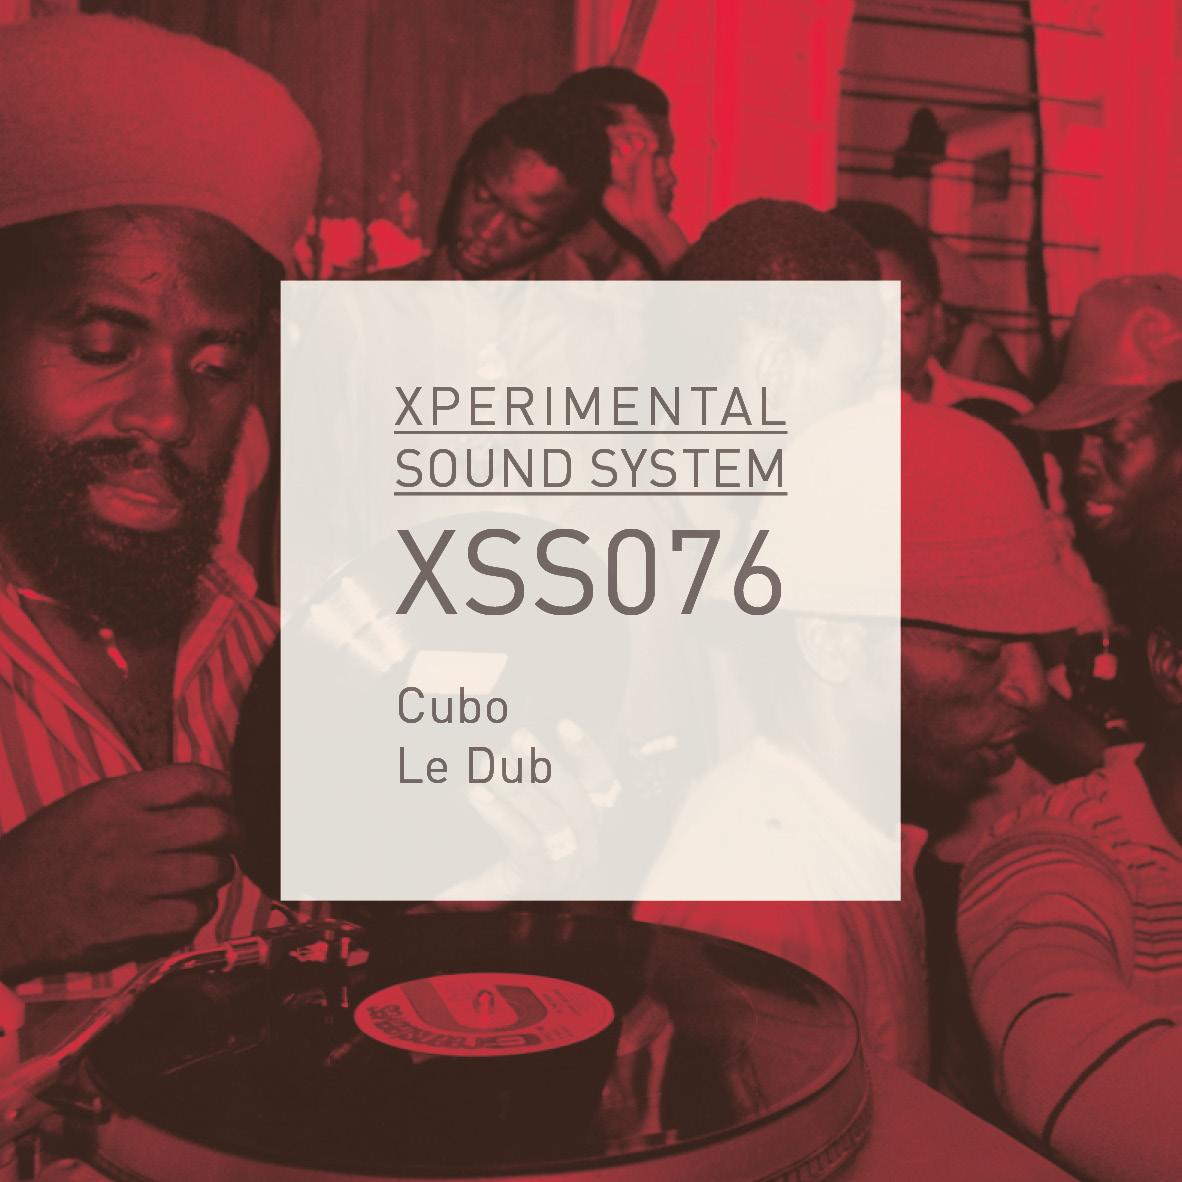 XSS076  |  Cubo  |  Le  Dub